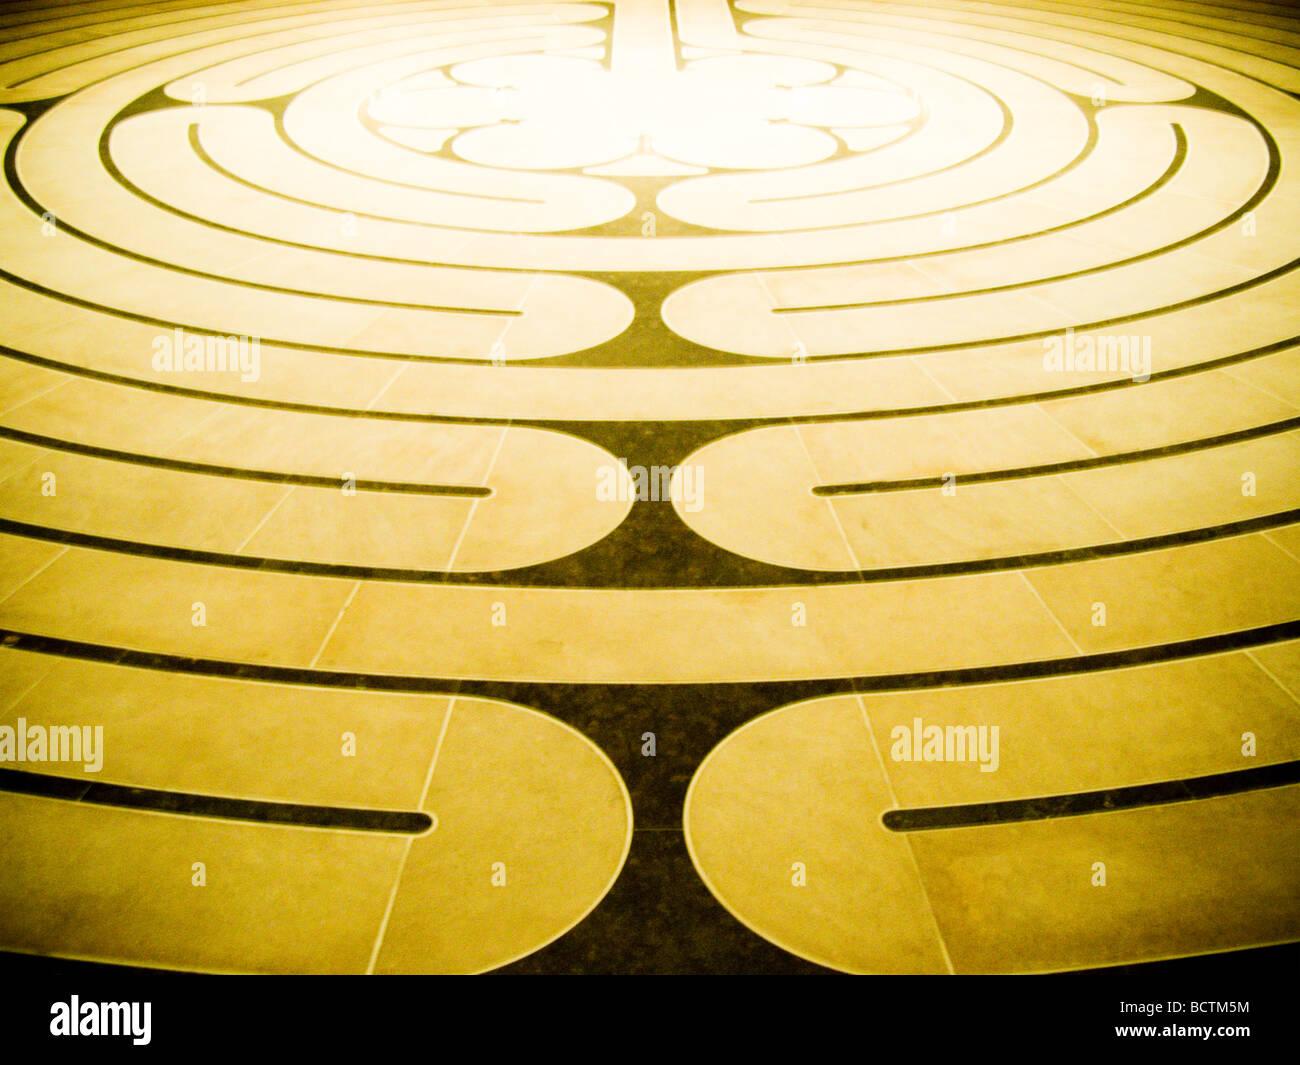 Braune und goldene Spirale Labyrinth Stock Muster Stockbild